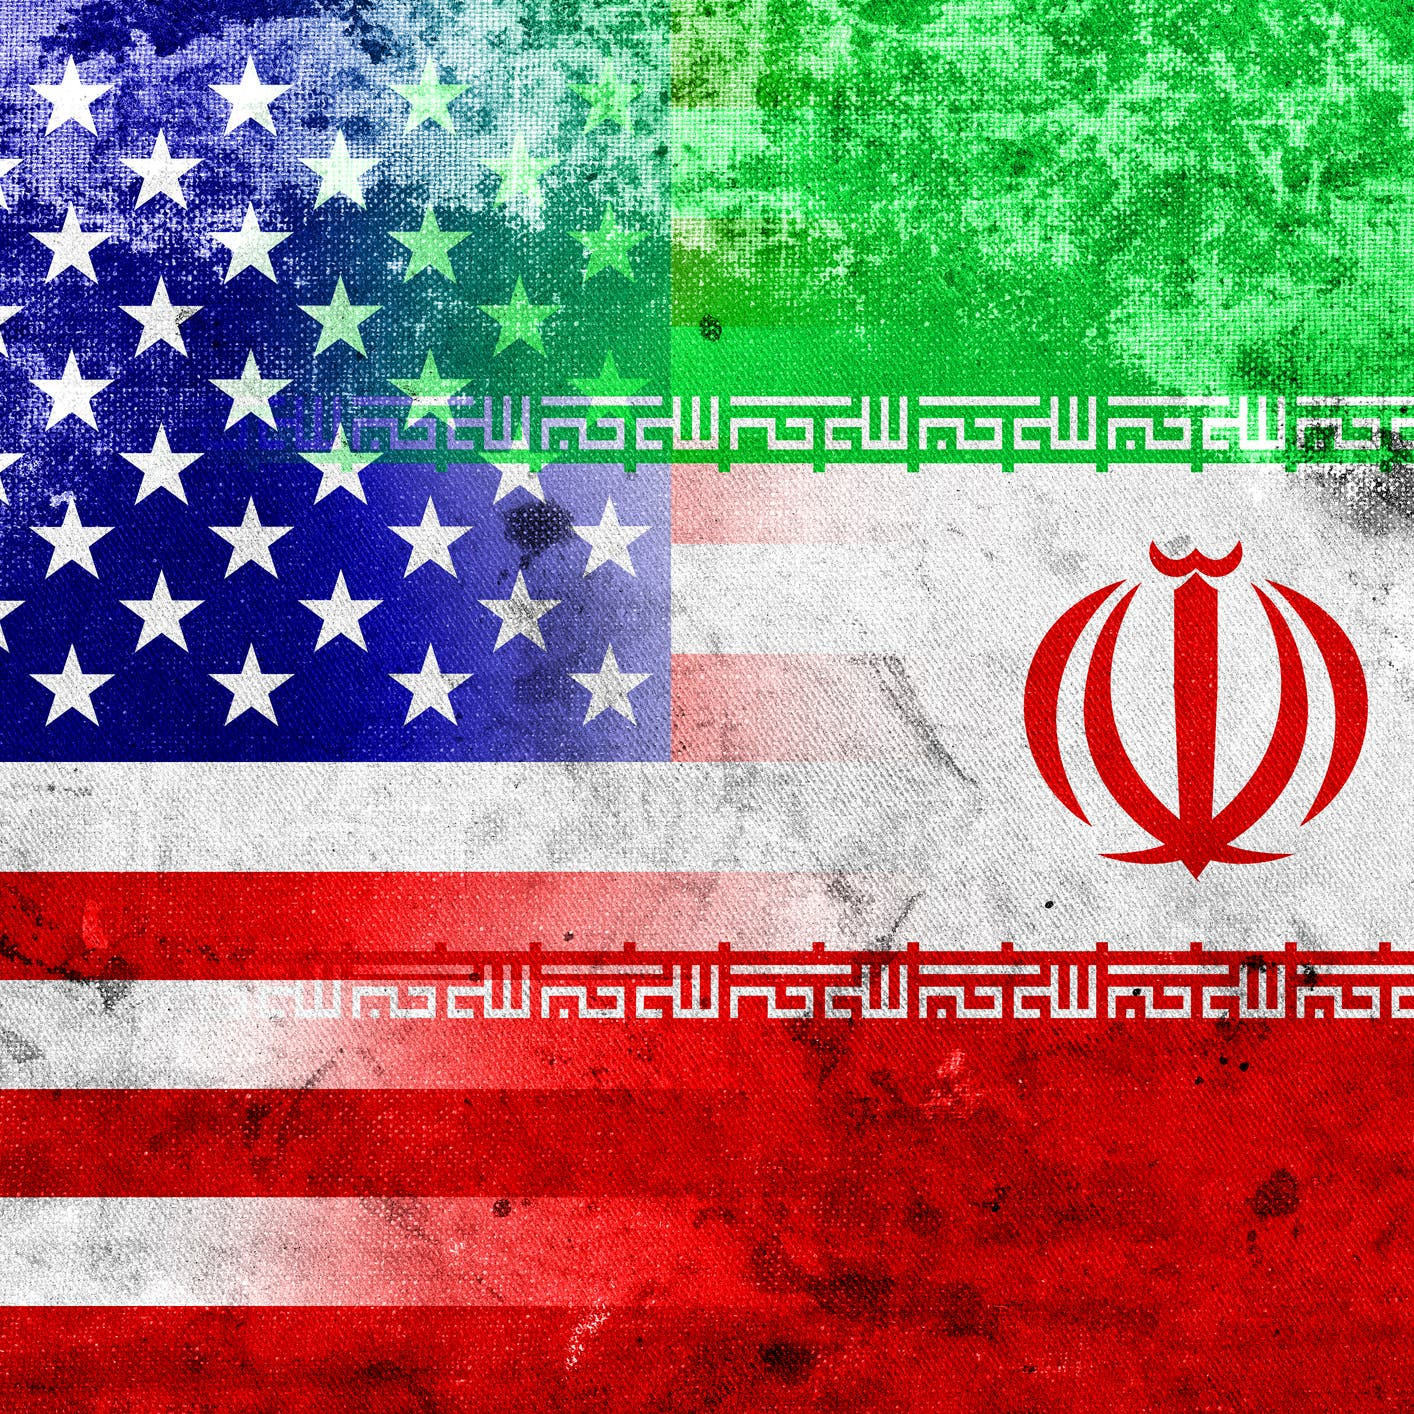 قلق أوروبي من مخاطر انهيار الاتفاق النووي مع إيران